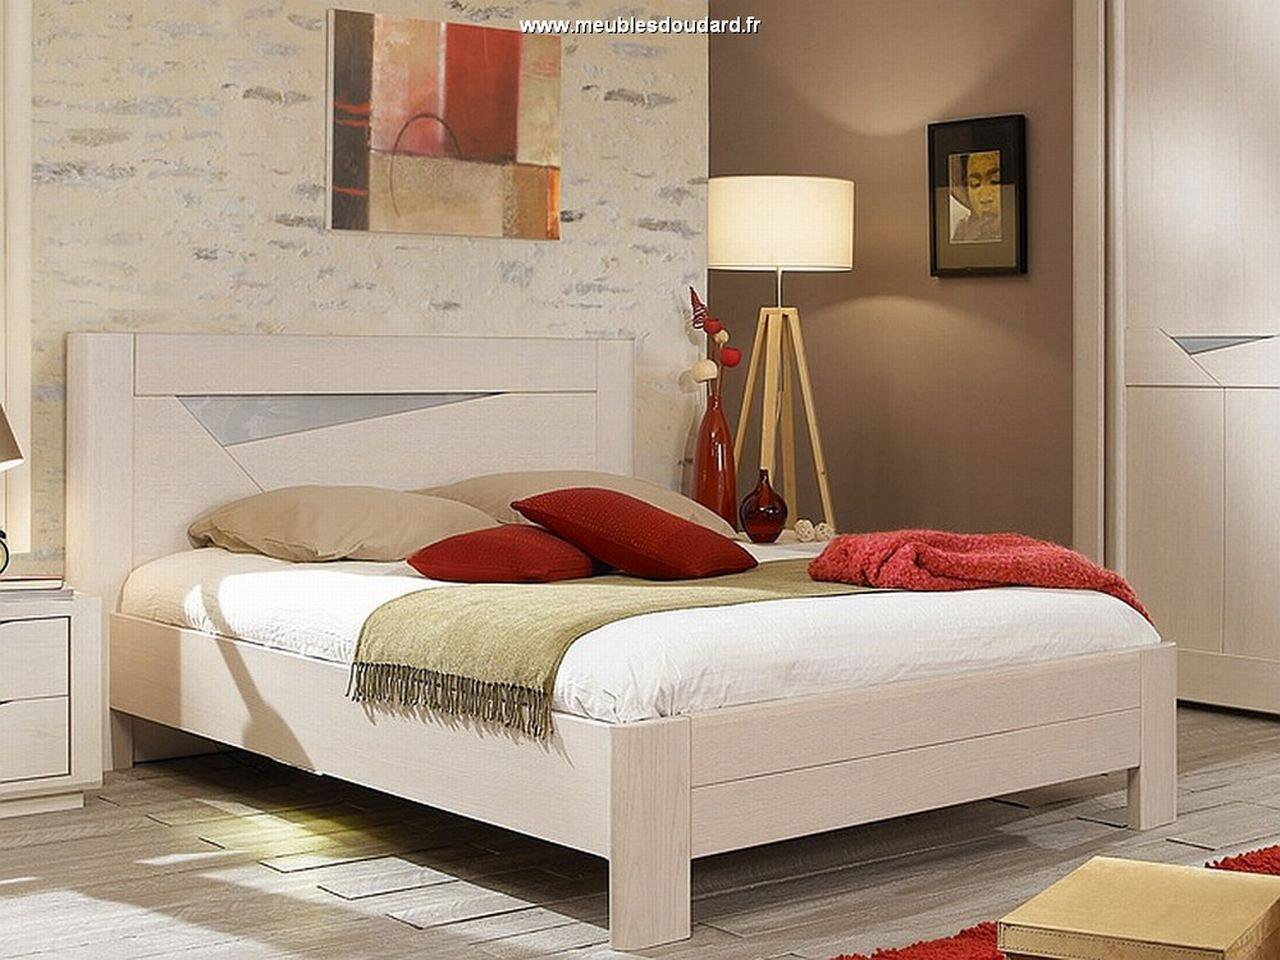 Bois de lit moderne en bois massif